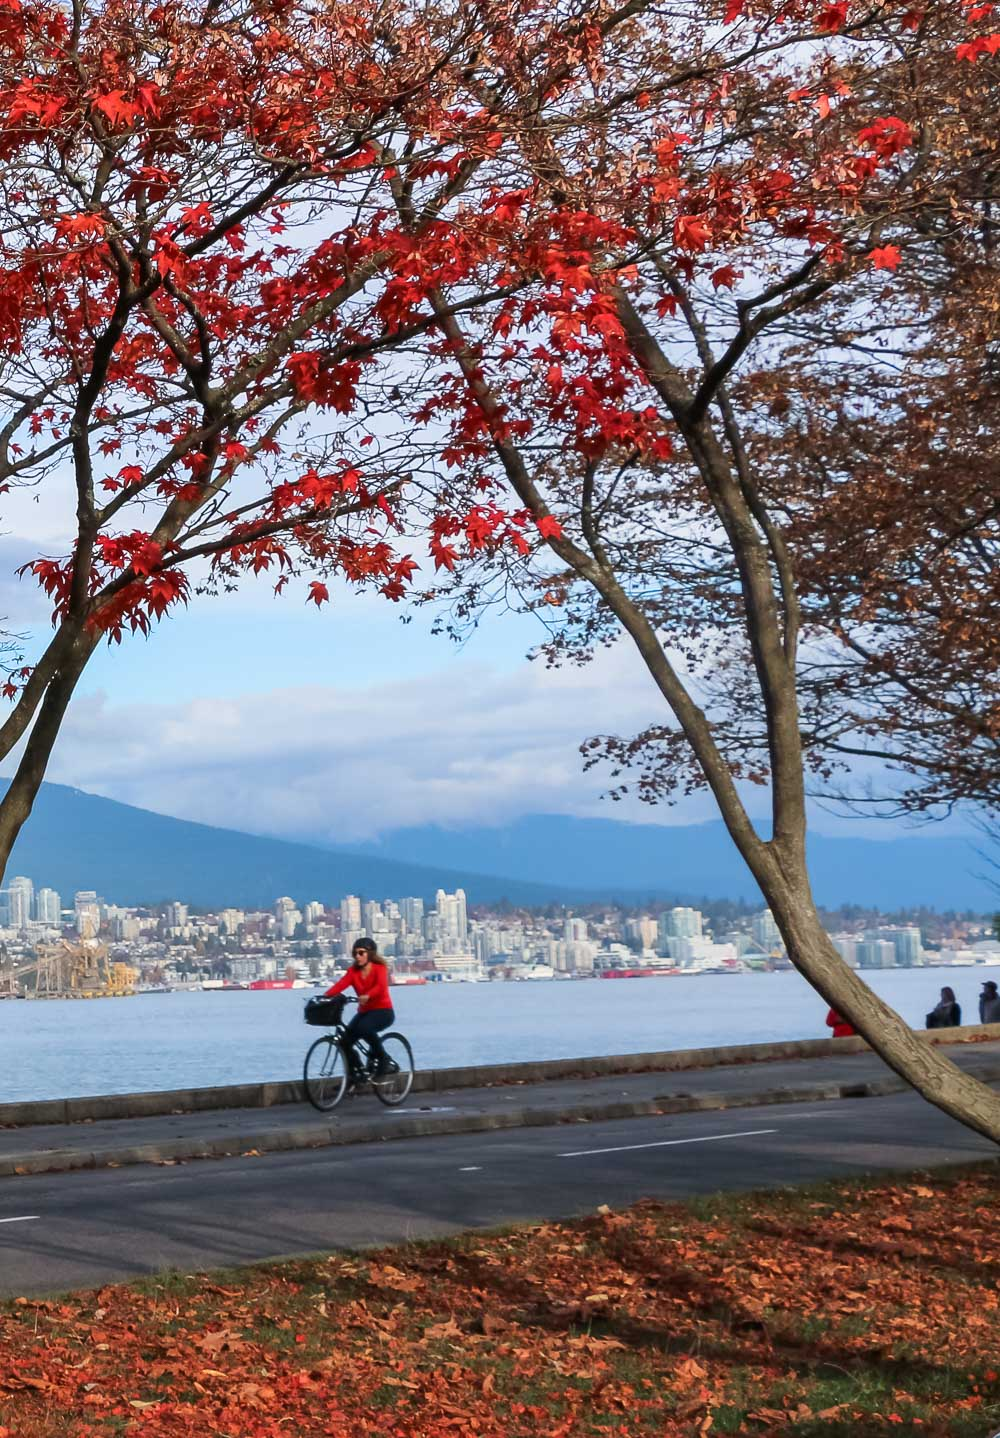 Canada - Roads and Destinations, roadsanddestinations.com